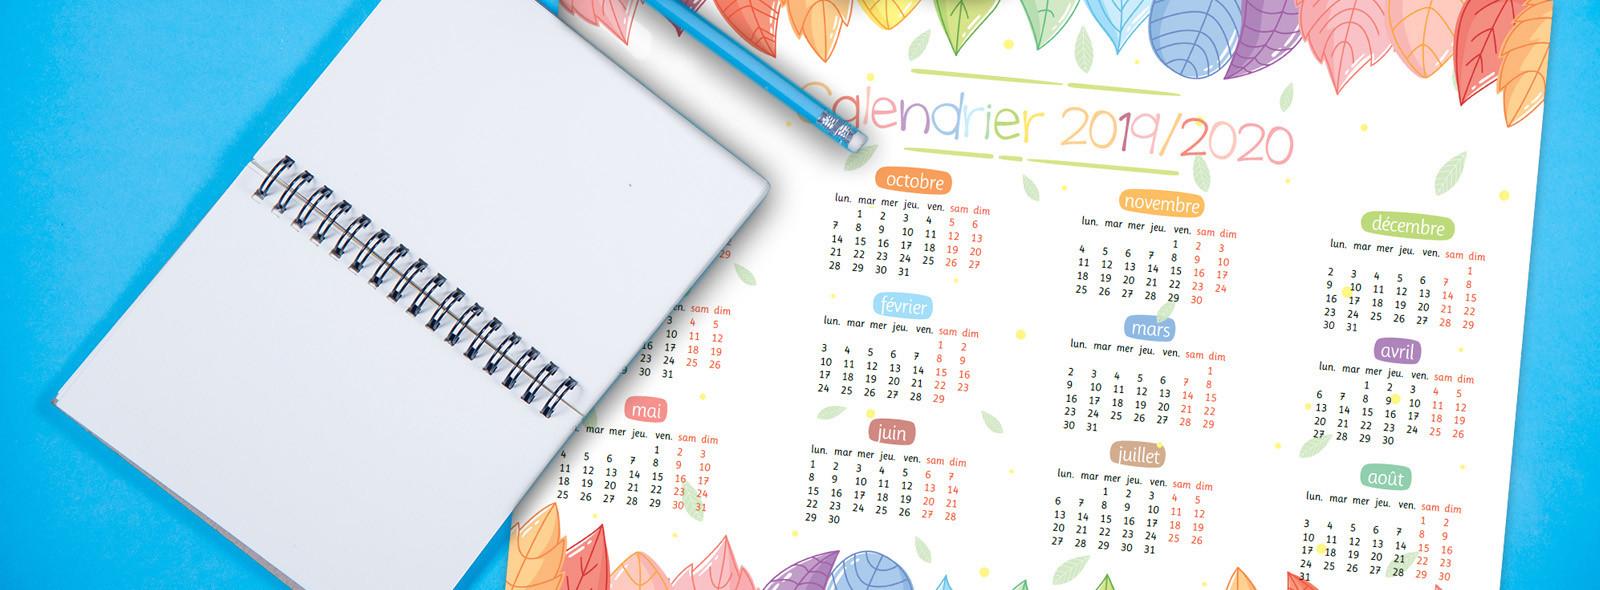 Calendrier 2019 2020 A Imprimer.Un Calendrier Annuel 2019 2020 La Taniere De Kyban